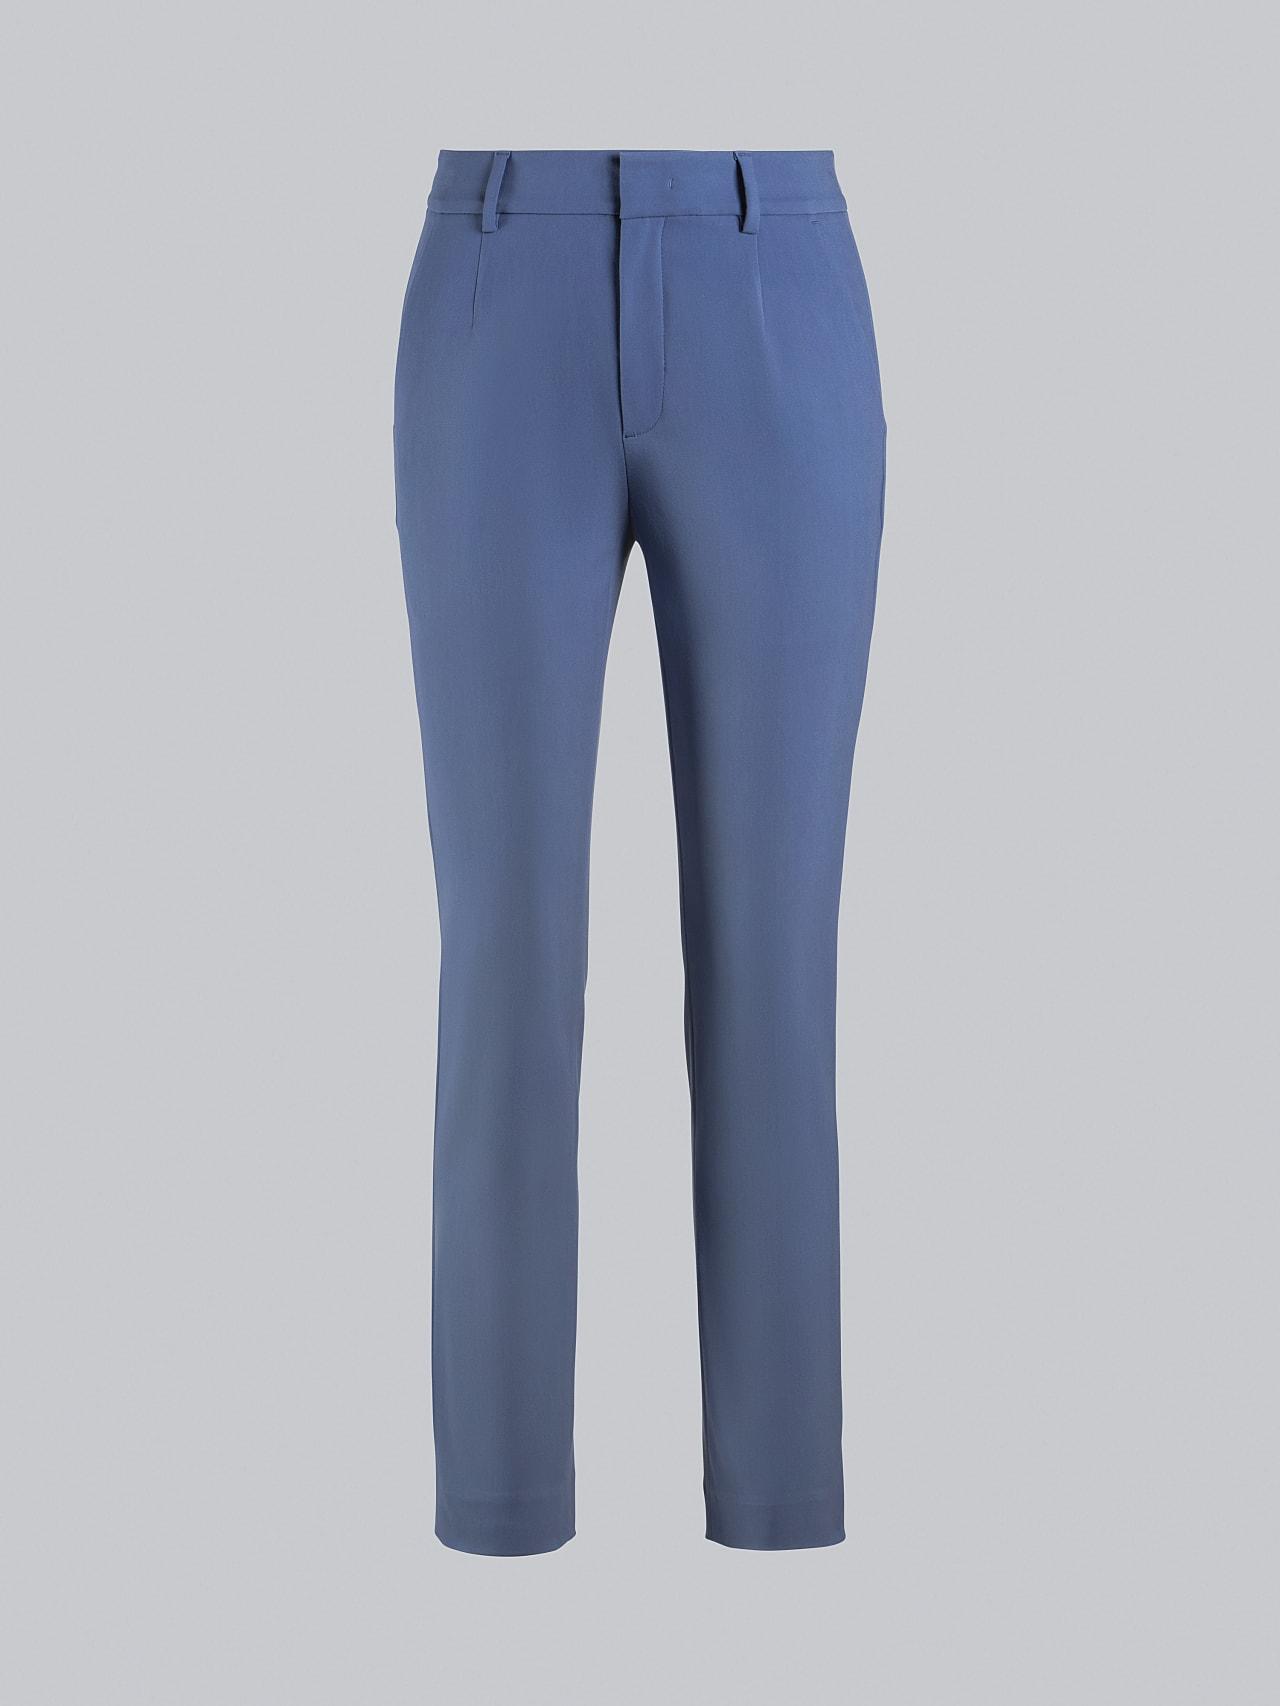 PERTI V1.Y5.02 Slim-Fit Tapered Pants light blue Back Alpha Tauri